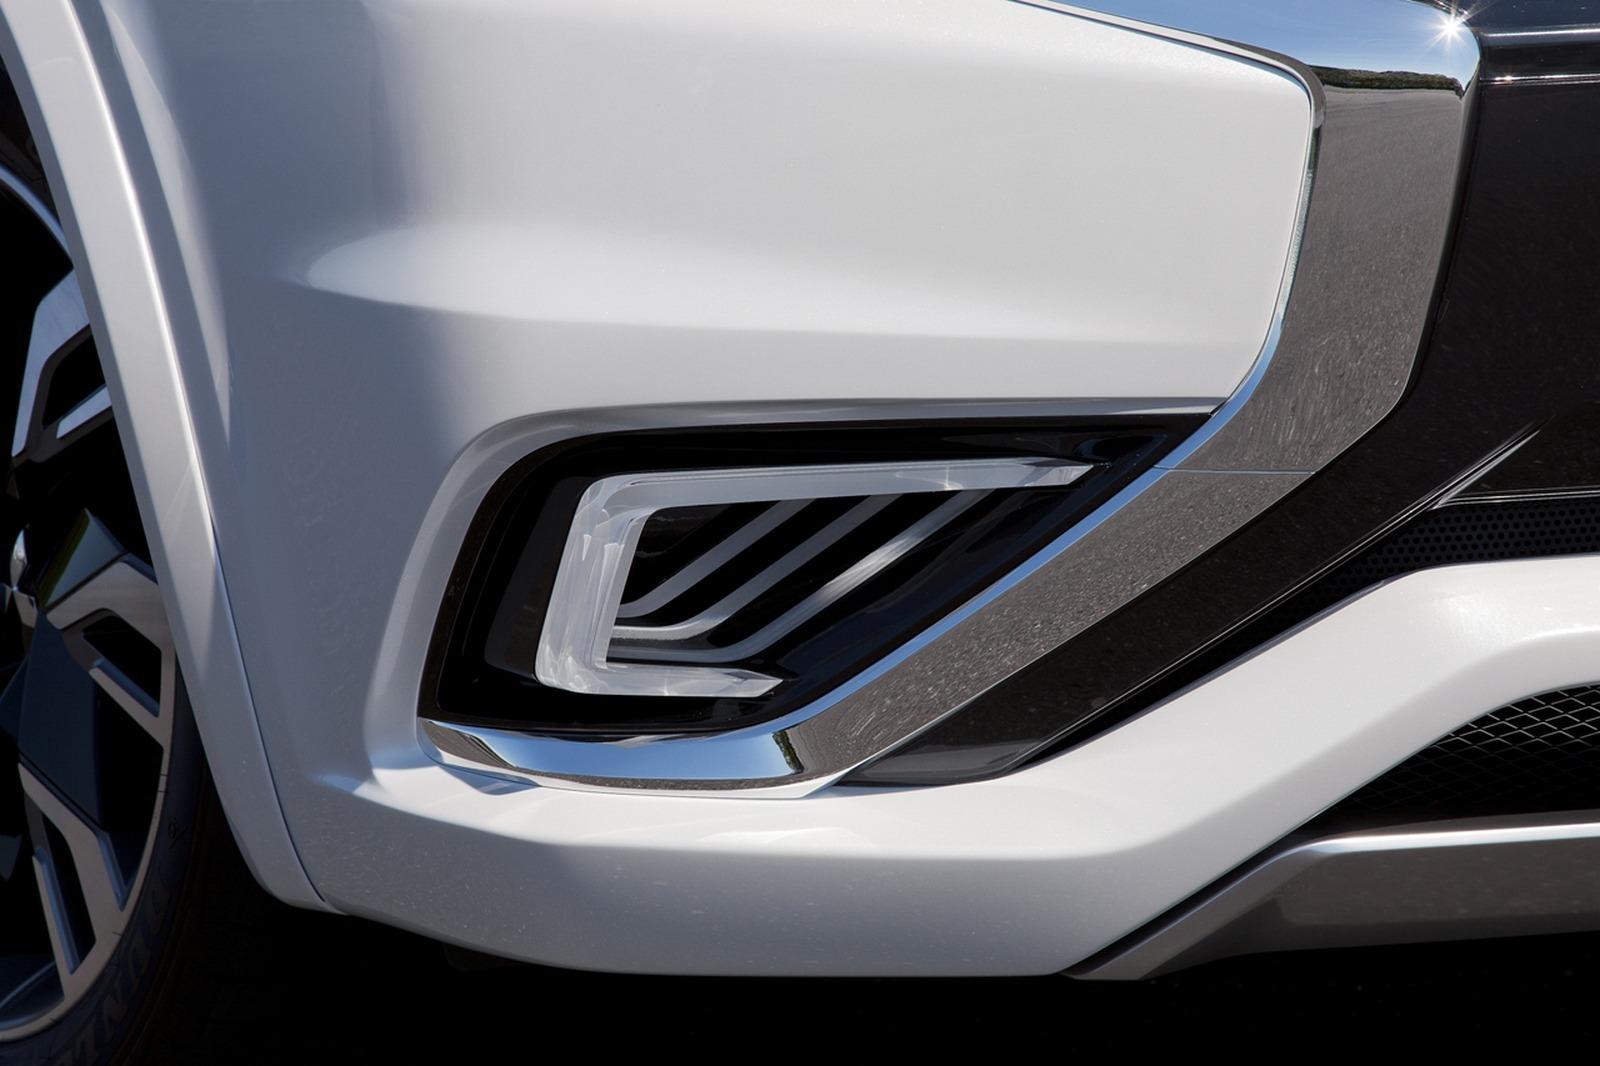 Foto de Mitsubishi Outlander PHEV Concept-S (34/49)